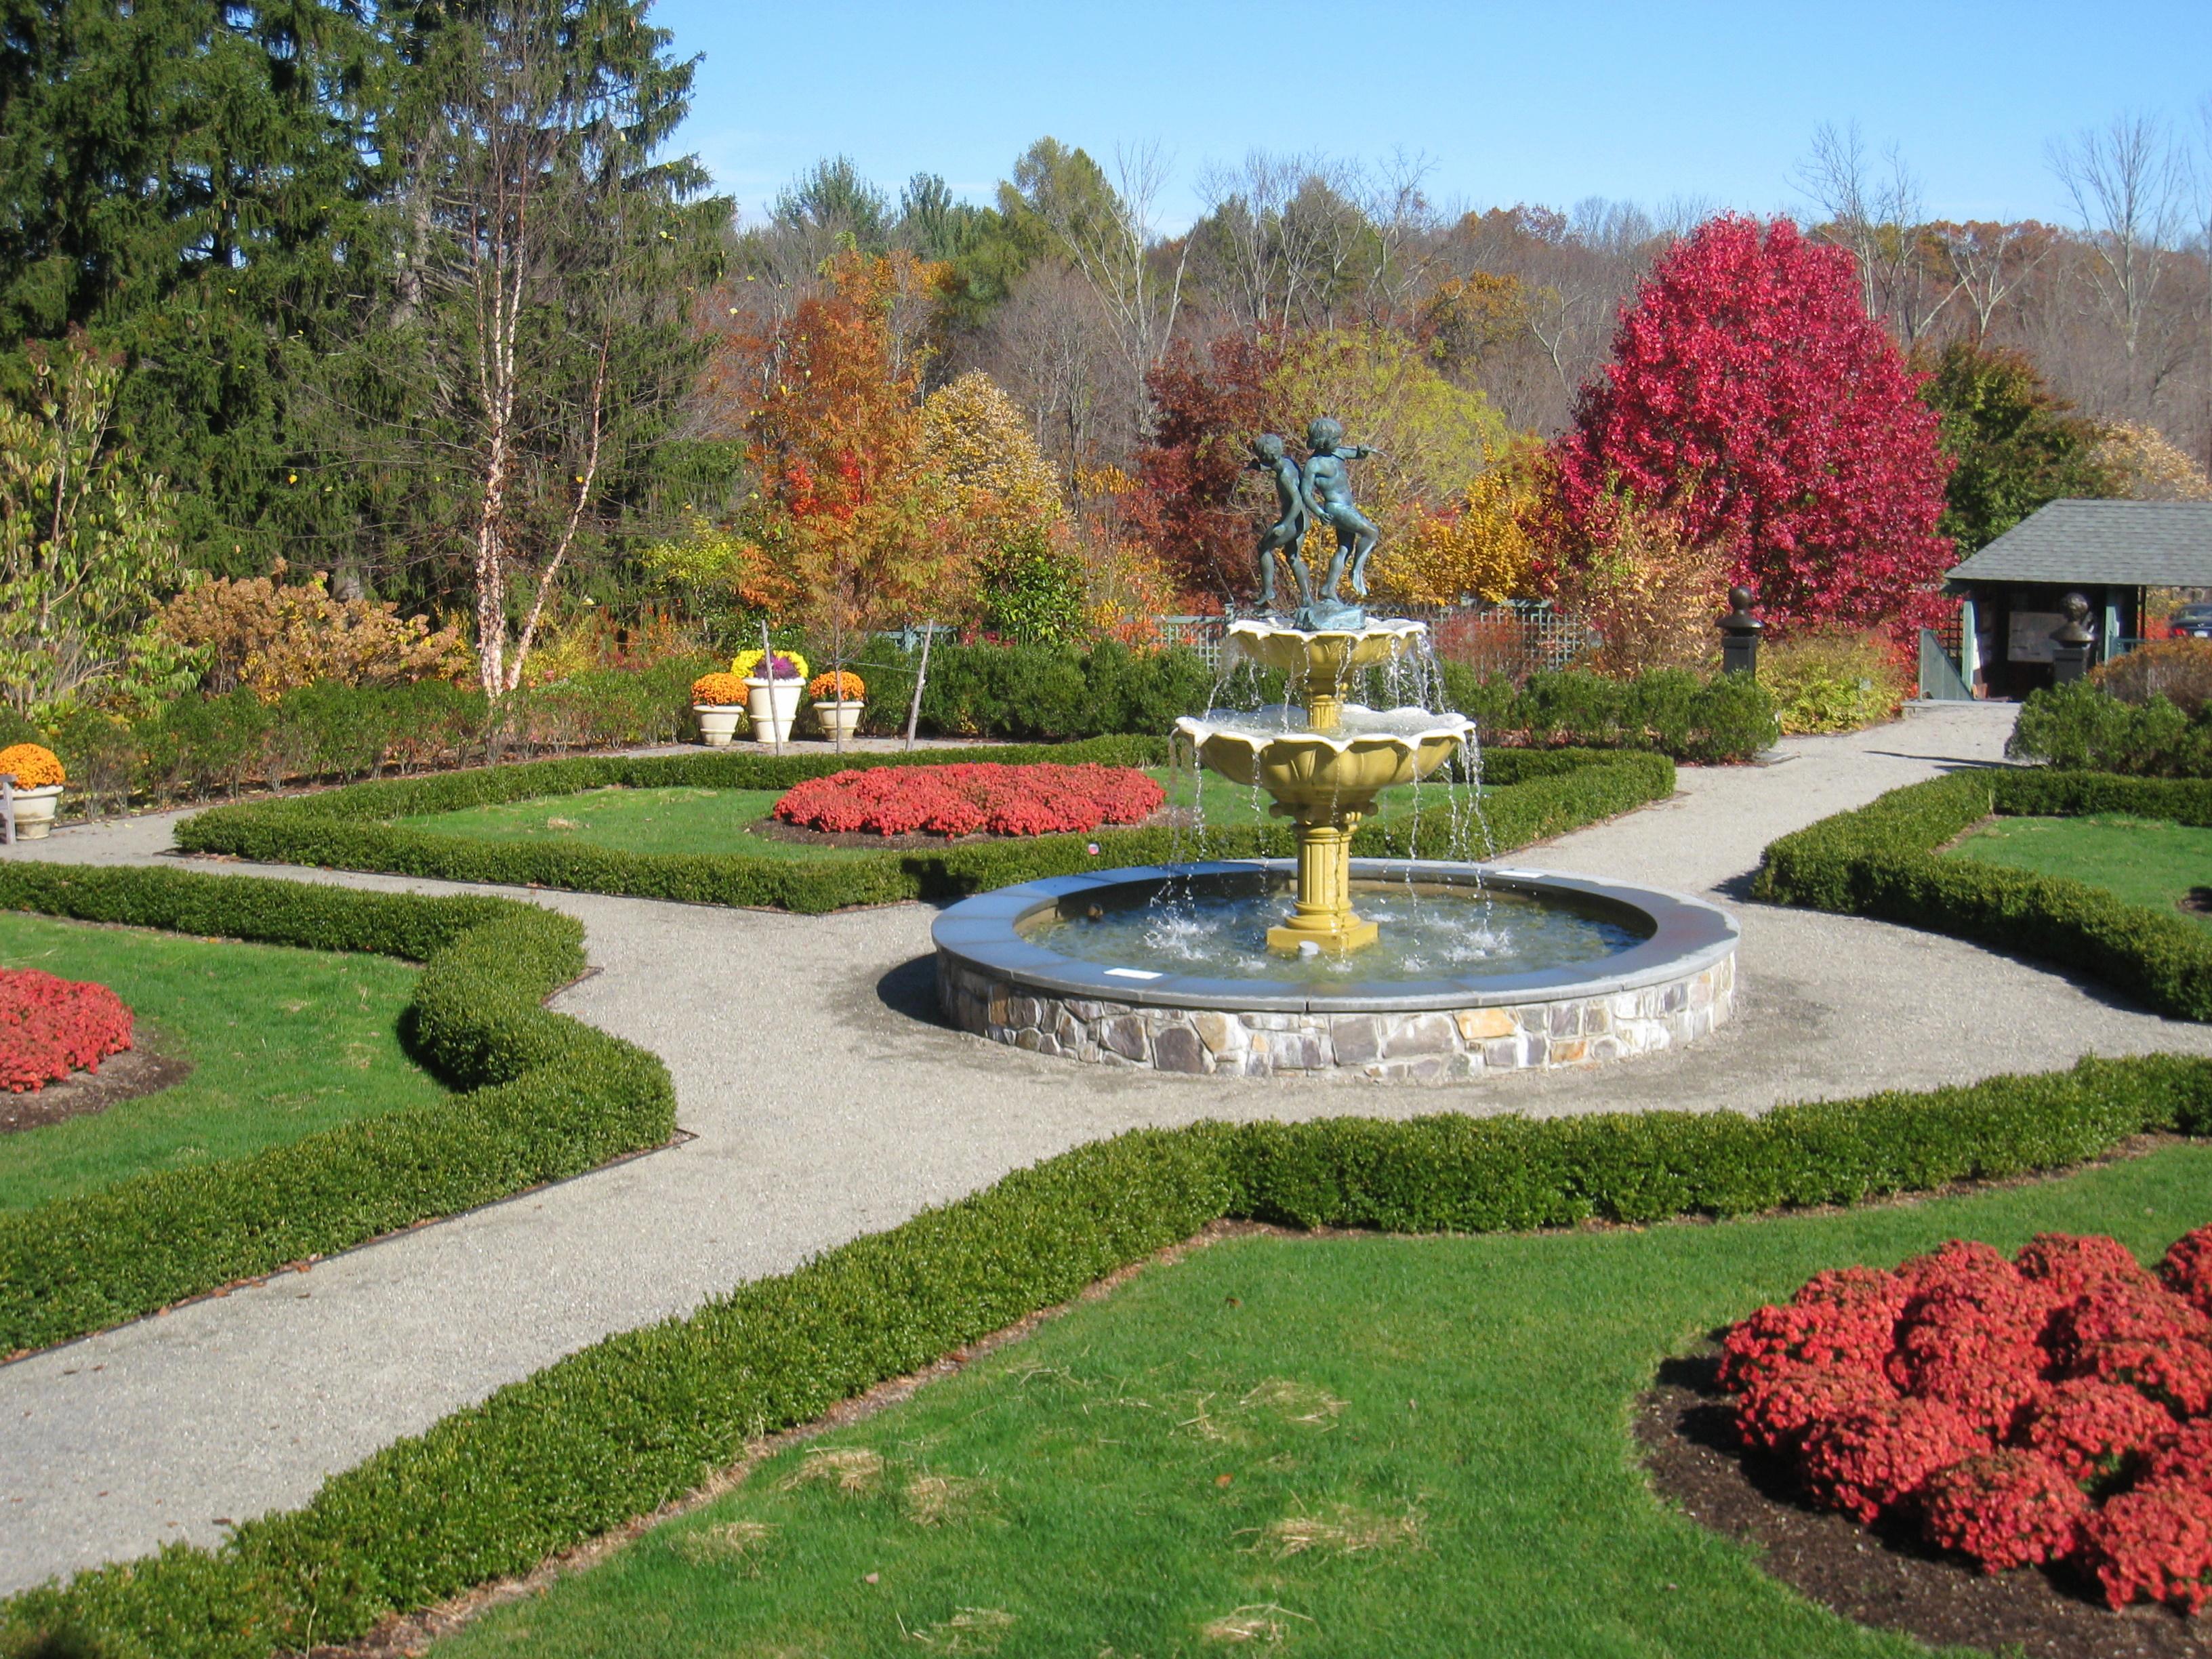 Lasdon Park and Arboretum, Somers, NY - IMG 1508